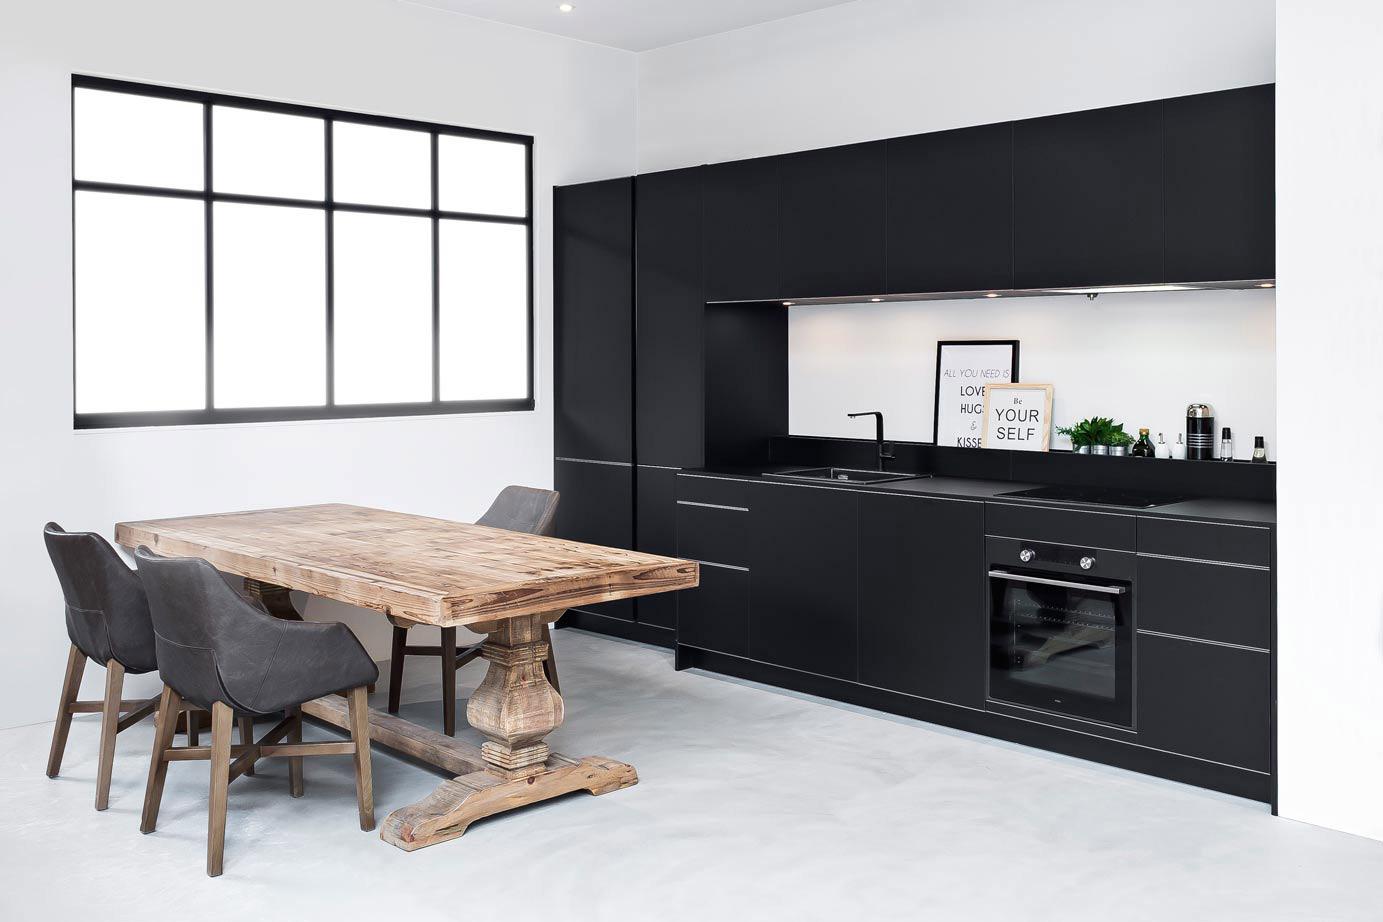 Met Zwart Keuken : Zwarte moderne keuken in rechte opstelling db keukens